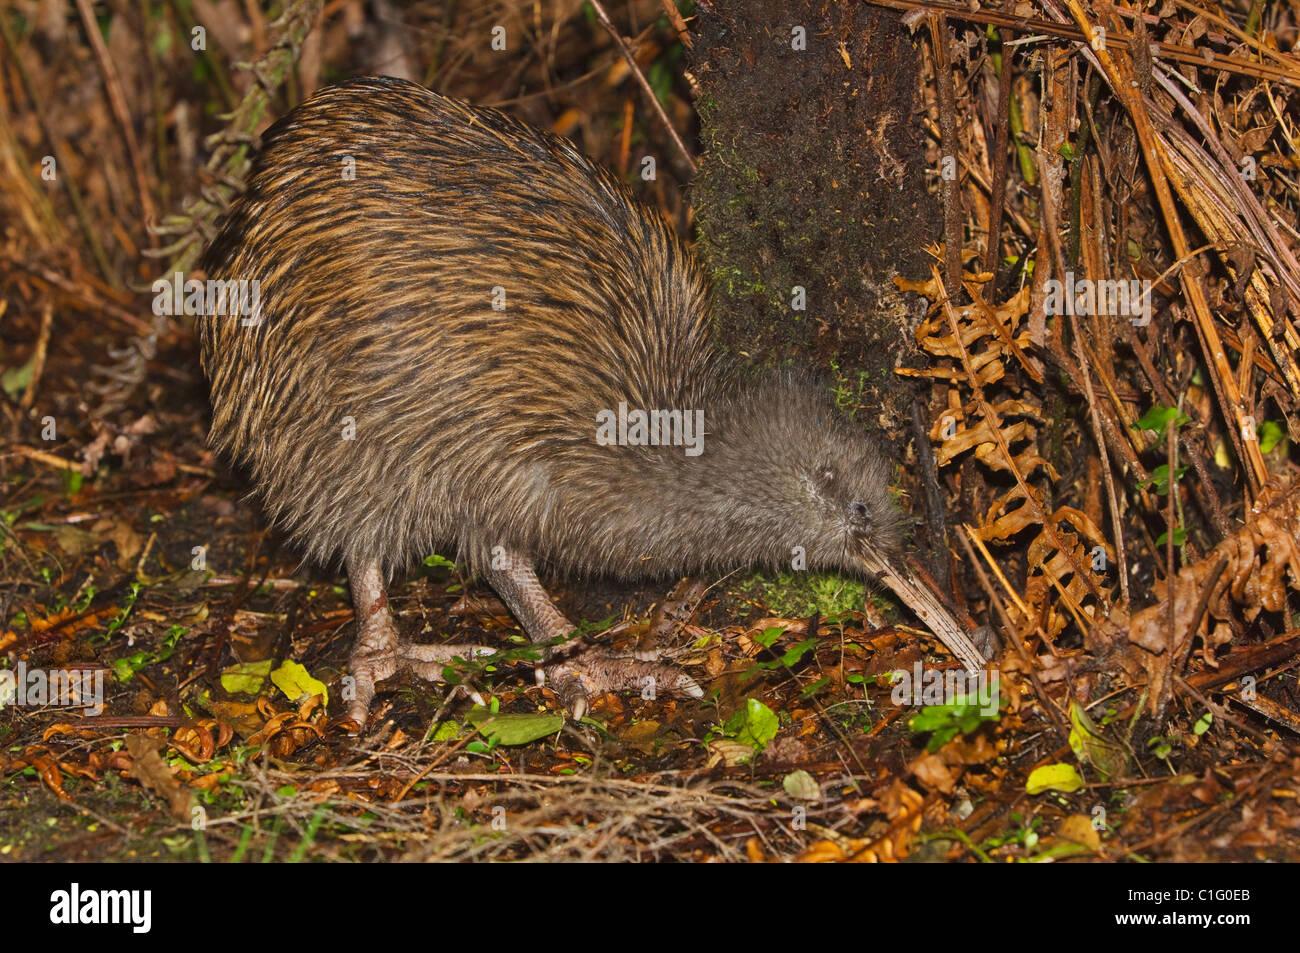 South Island brown kiwi (Apteryx australis), Stewart Island, New Zealand. - Stock Image